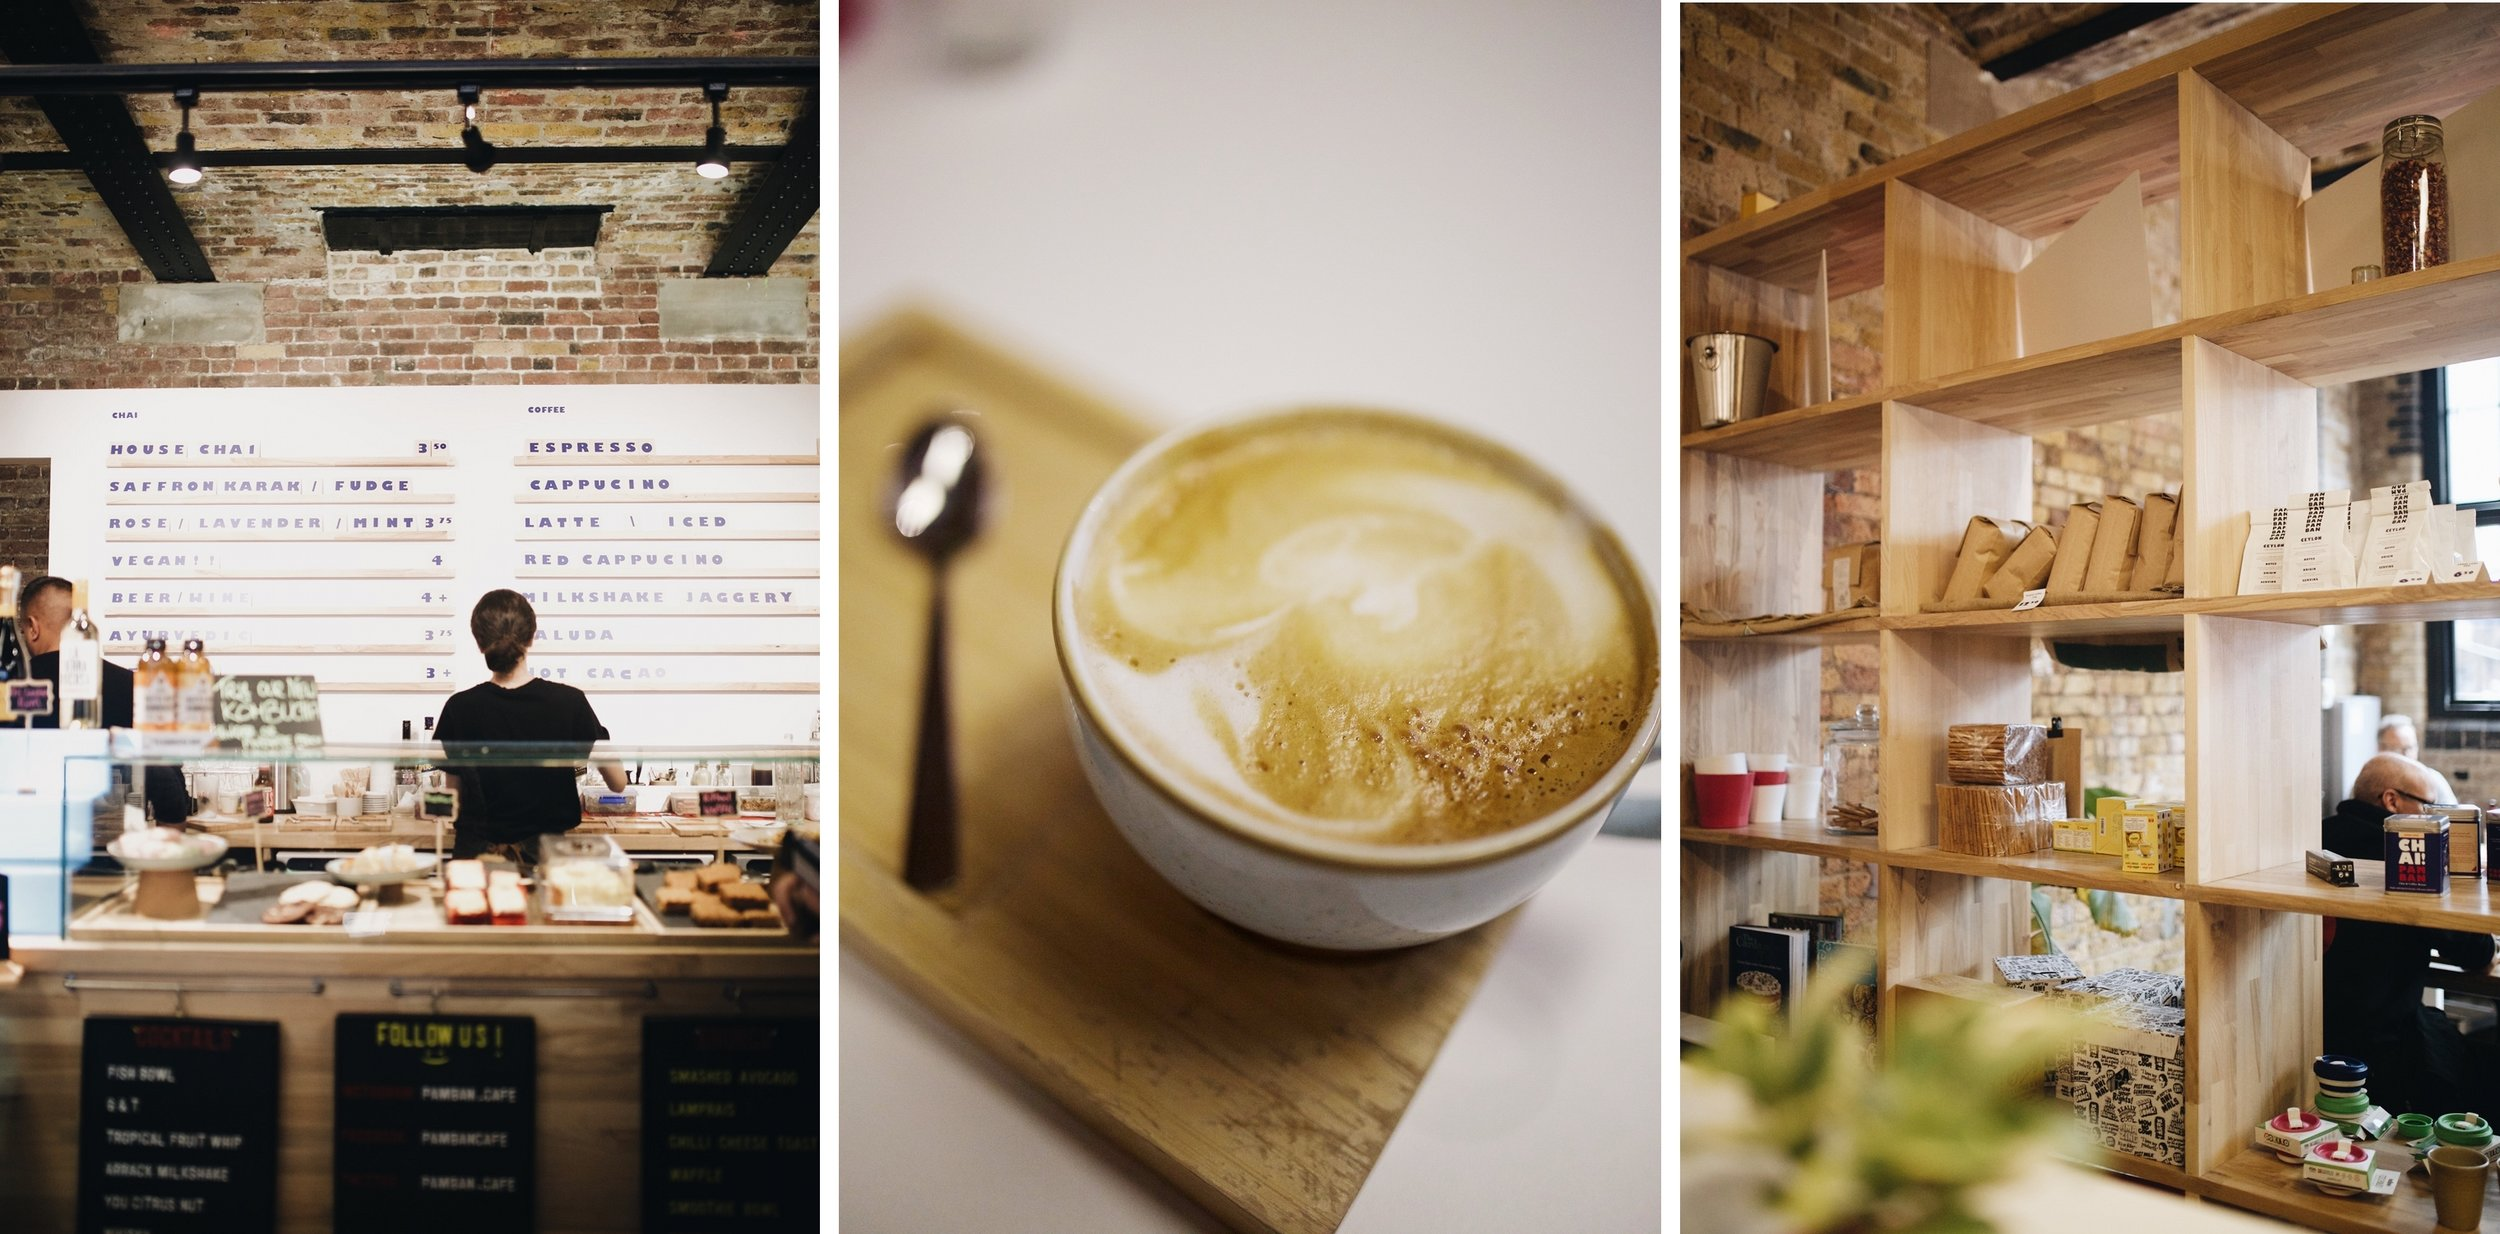 pamban chai coffee house londres.jpg